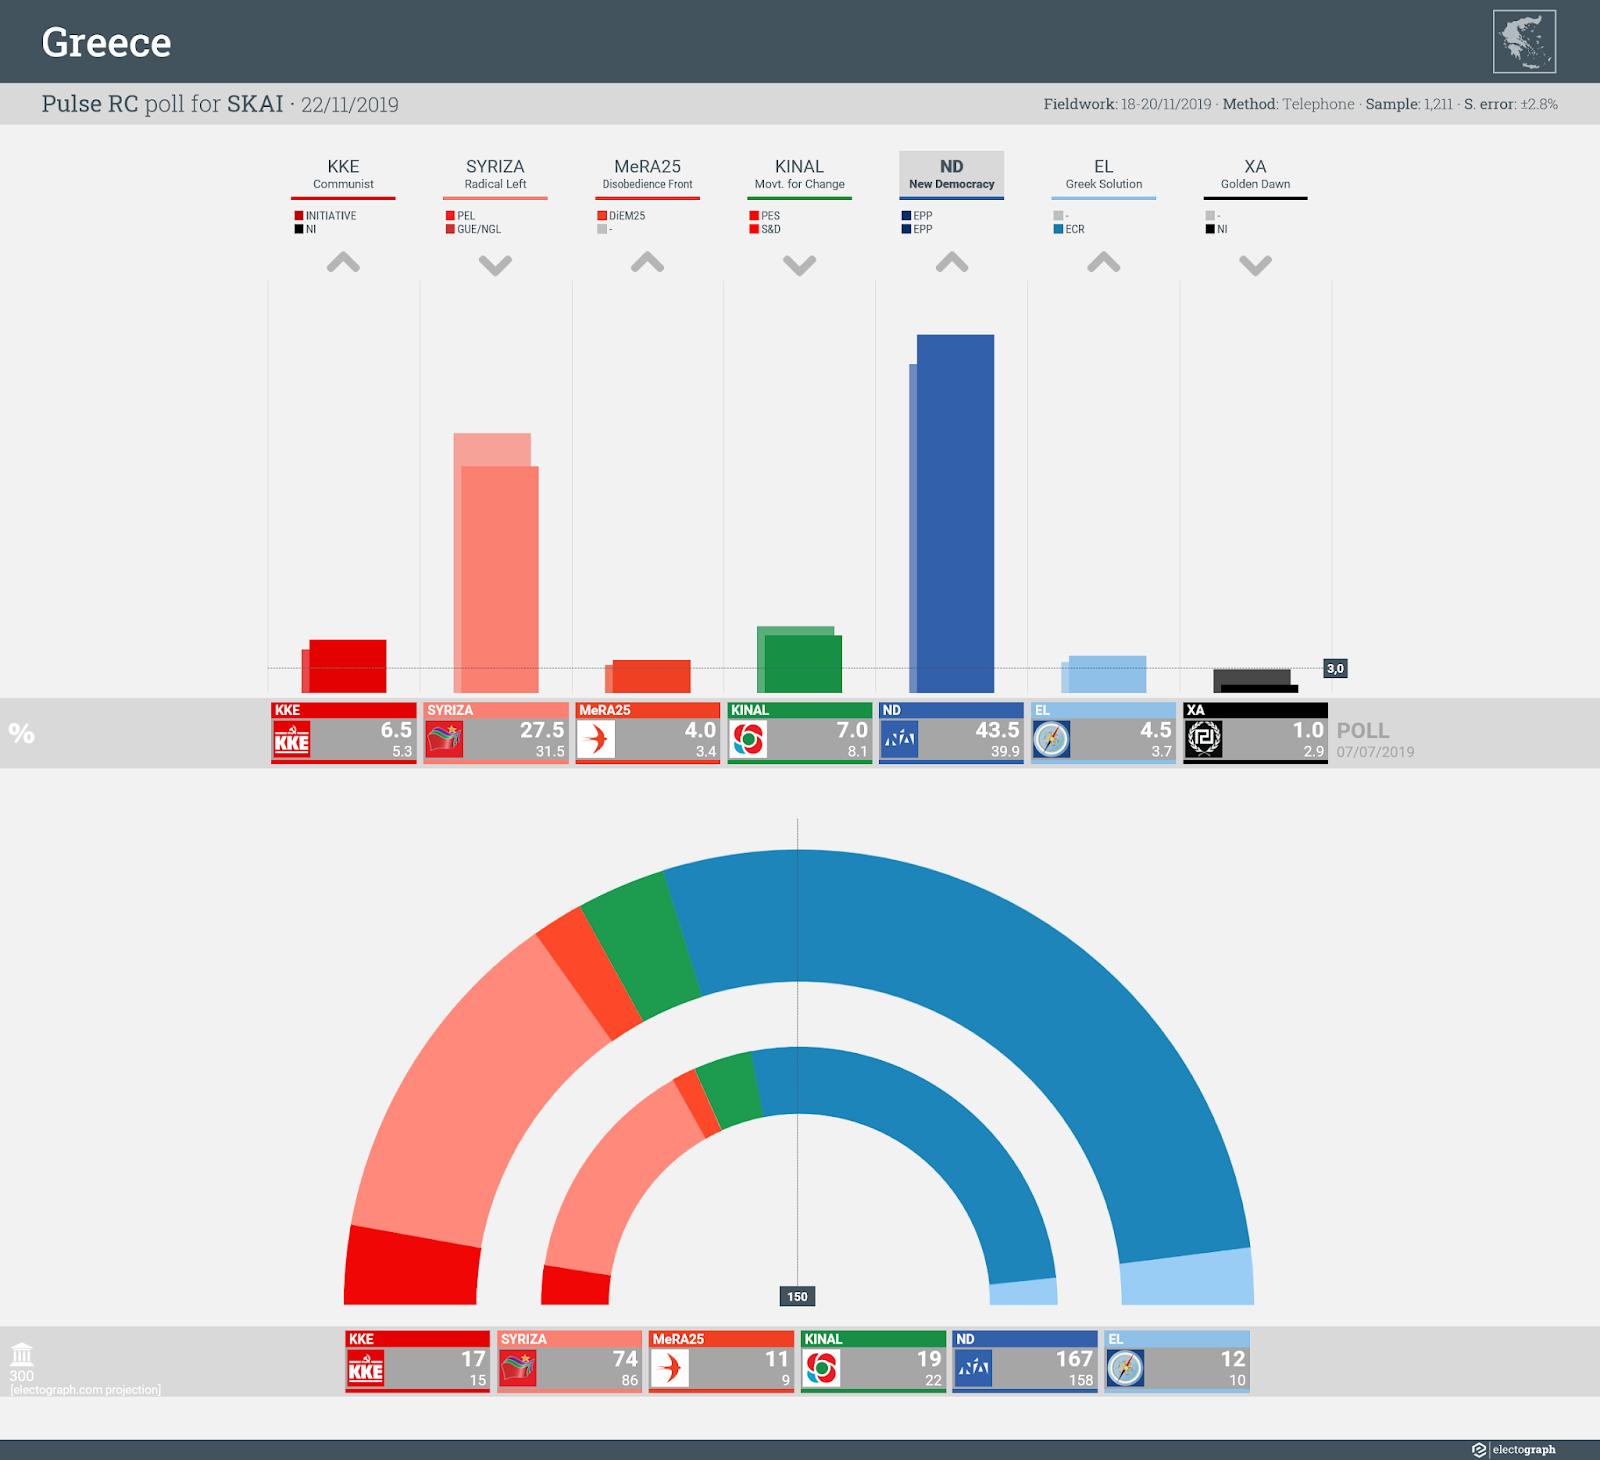 GREECE: Pulse RC poll chart for SKAI, 22 November 2019